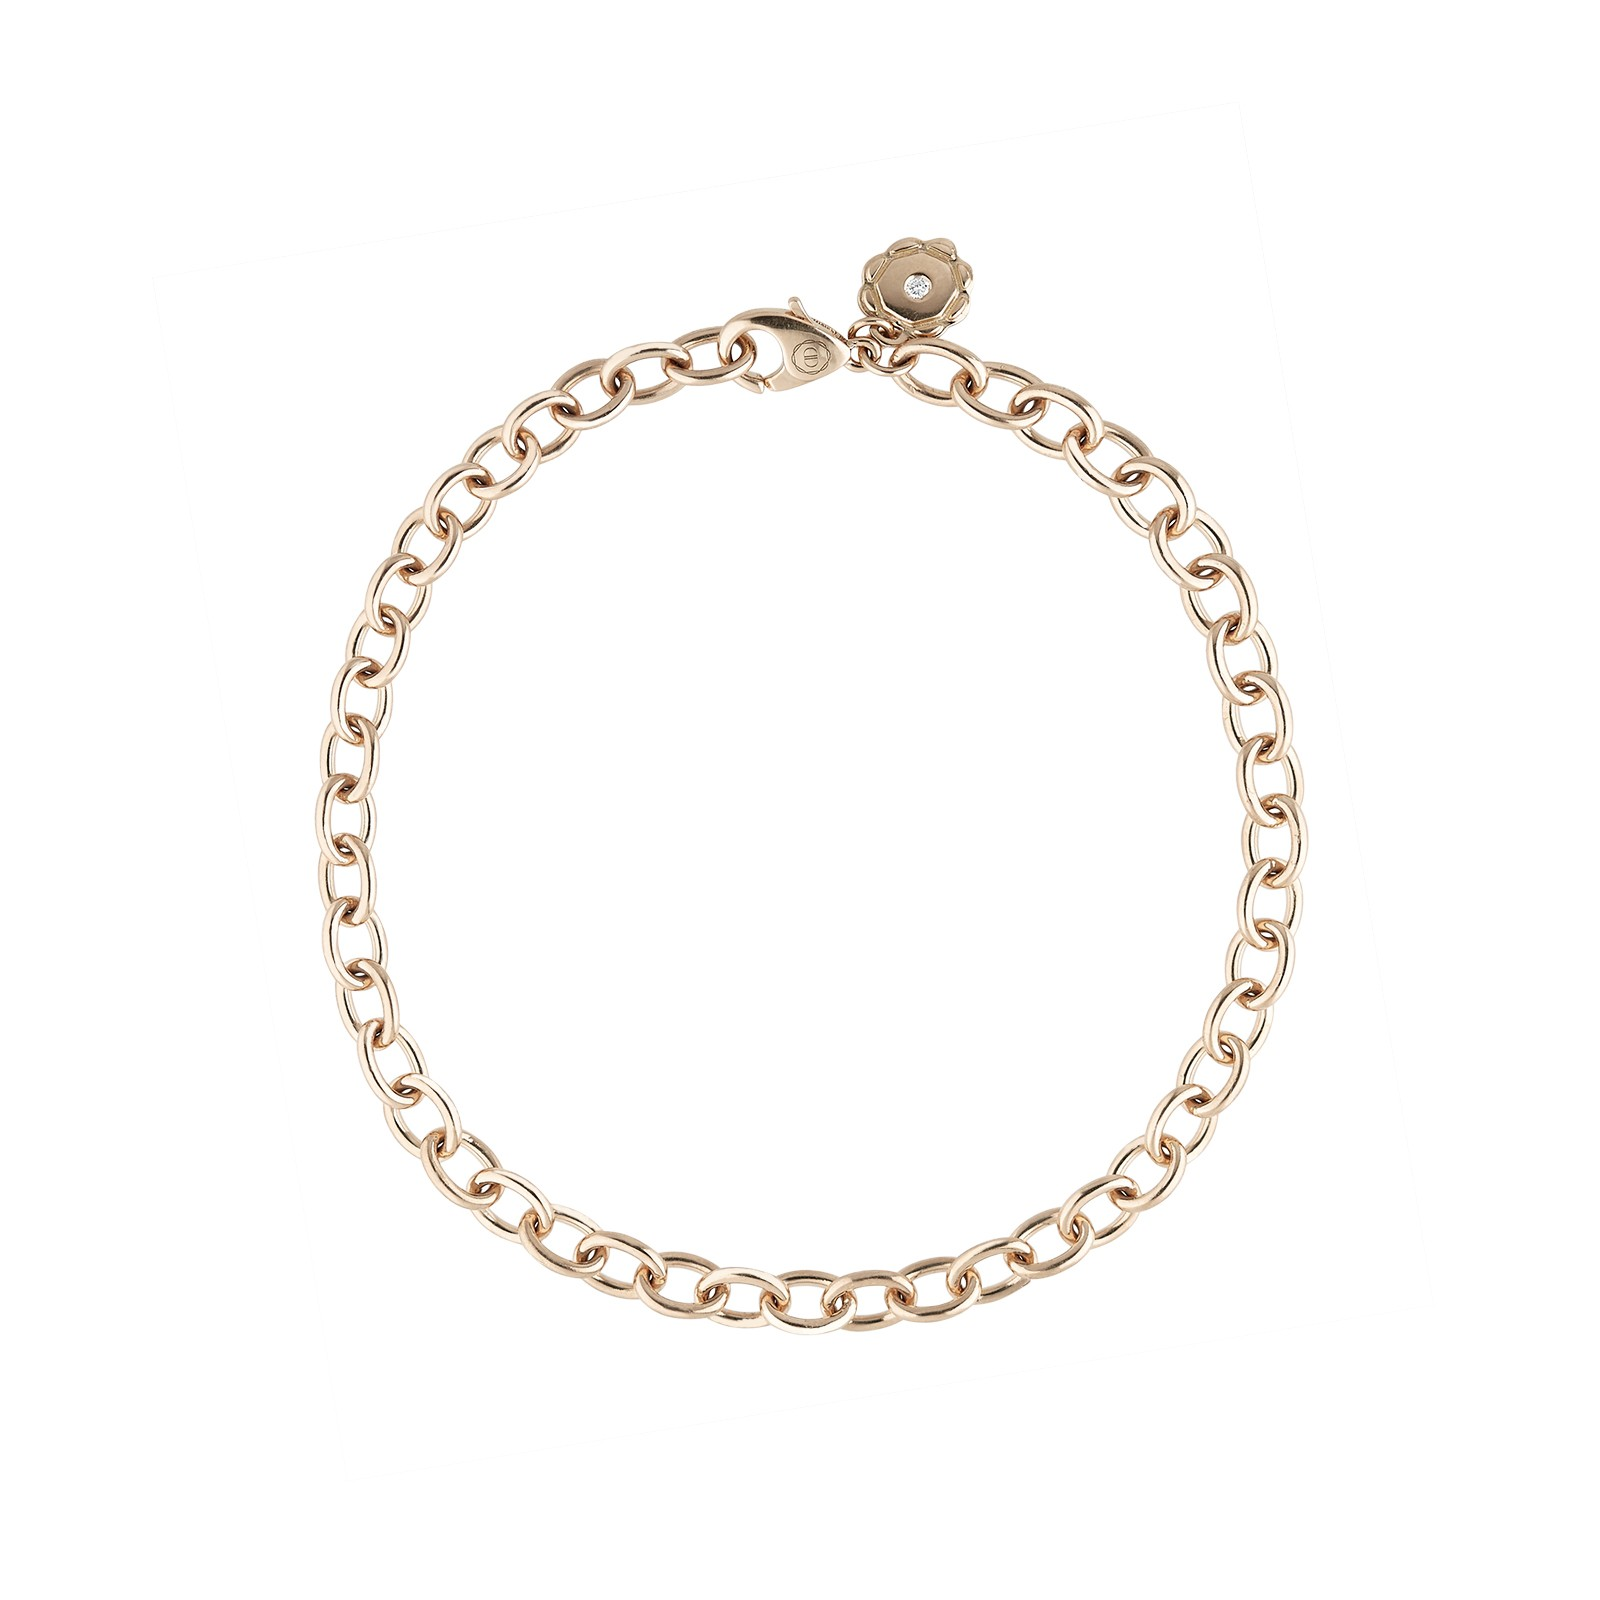 AIDIA Signature 7'' 18K Rose Gold Charm Bracelet